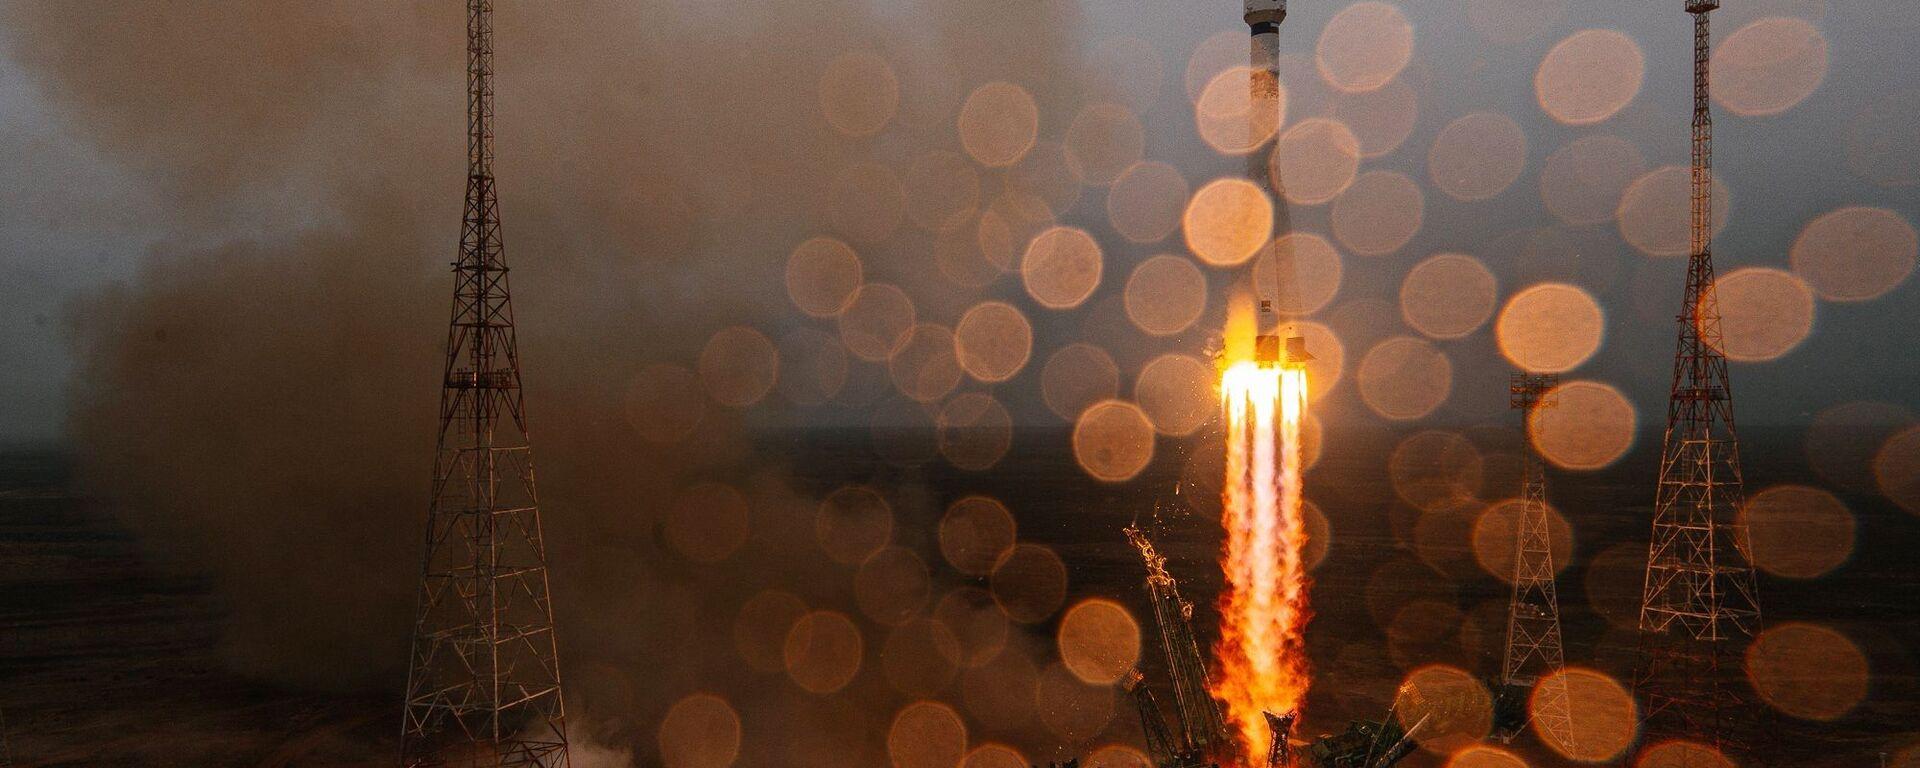 Nosná raketa Sojuz-2.1a  - Sputnik Česká republika, 1920, 09.04.2021